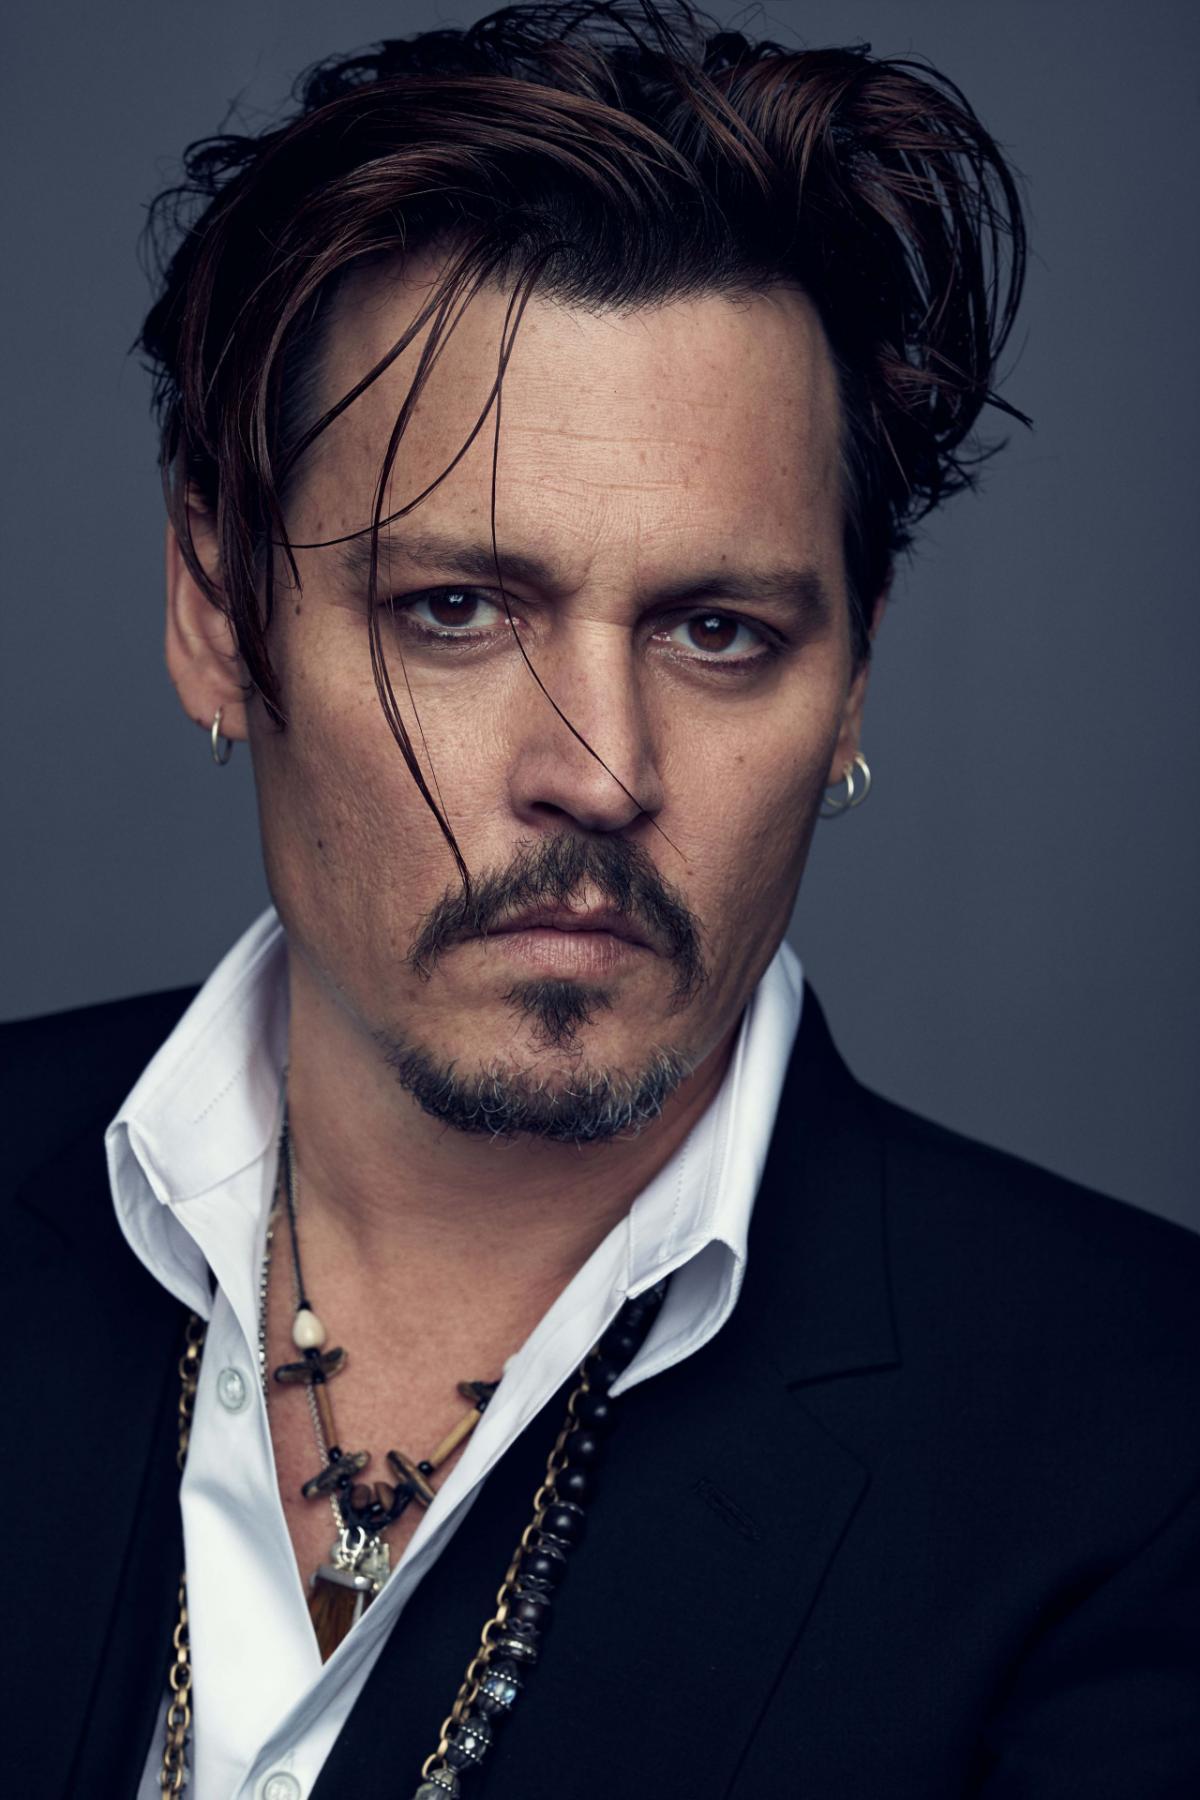 Johnny Depp elegant classic beard style